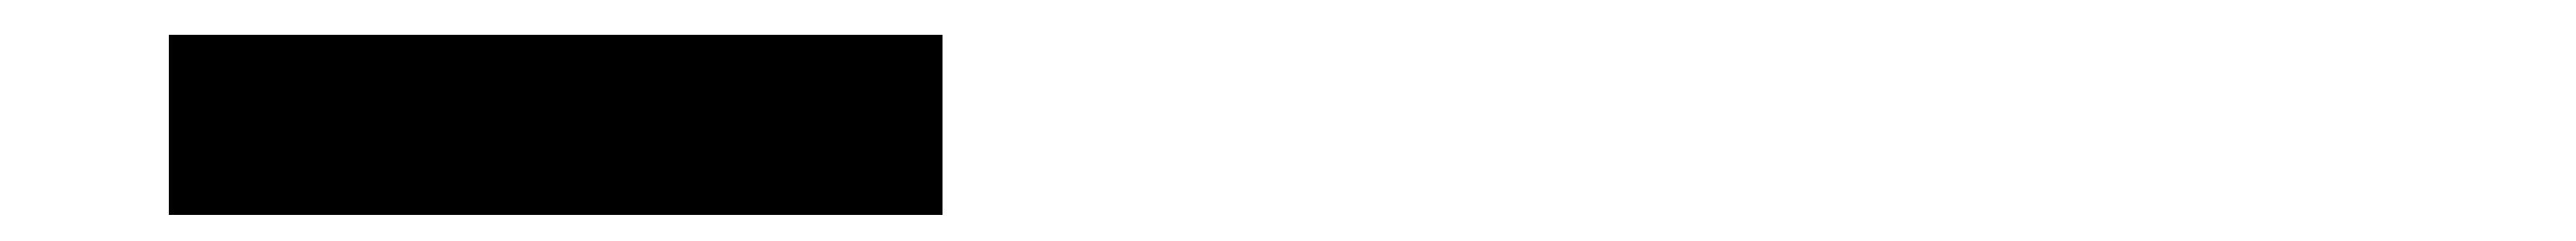 Typeface-Heimat-Mono-F02-Atlas-Font-Foundry